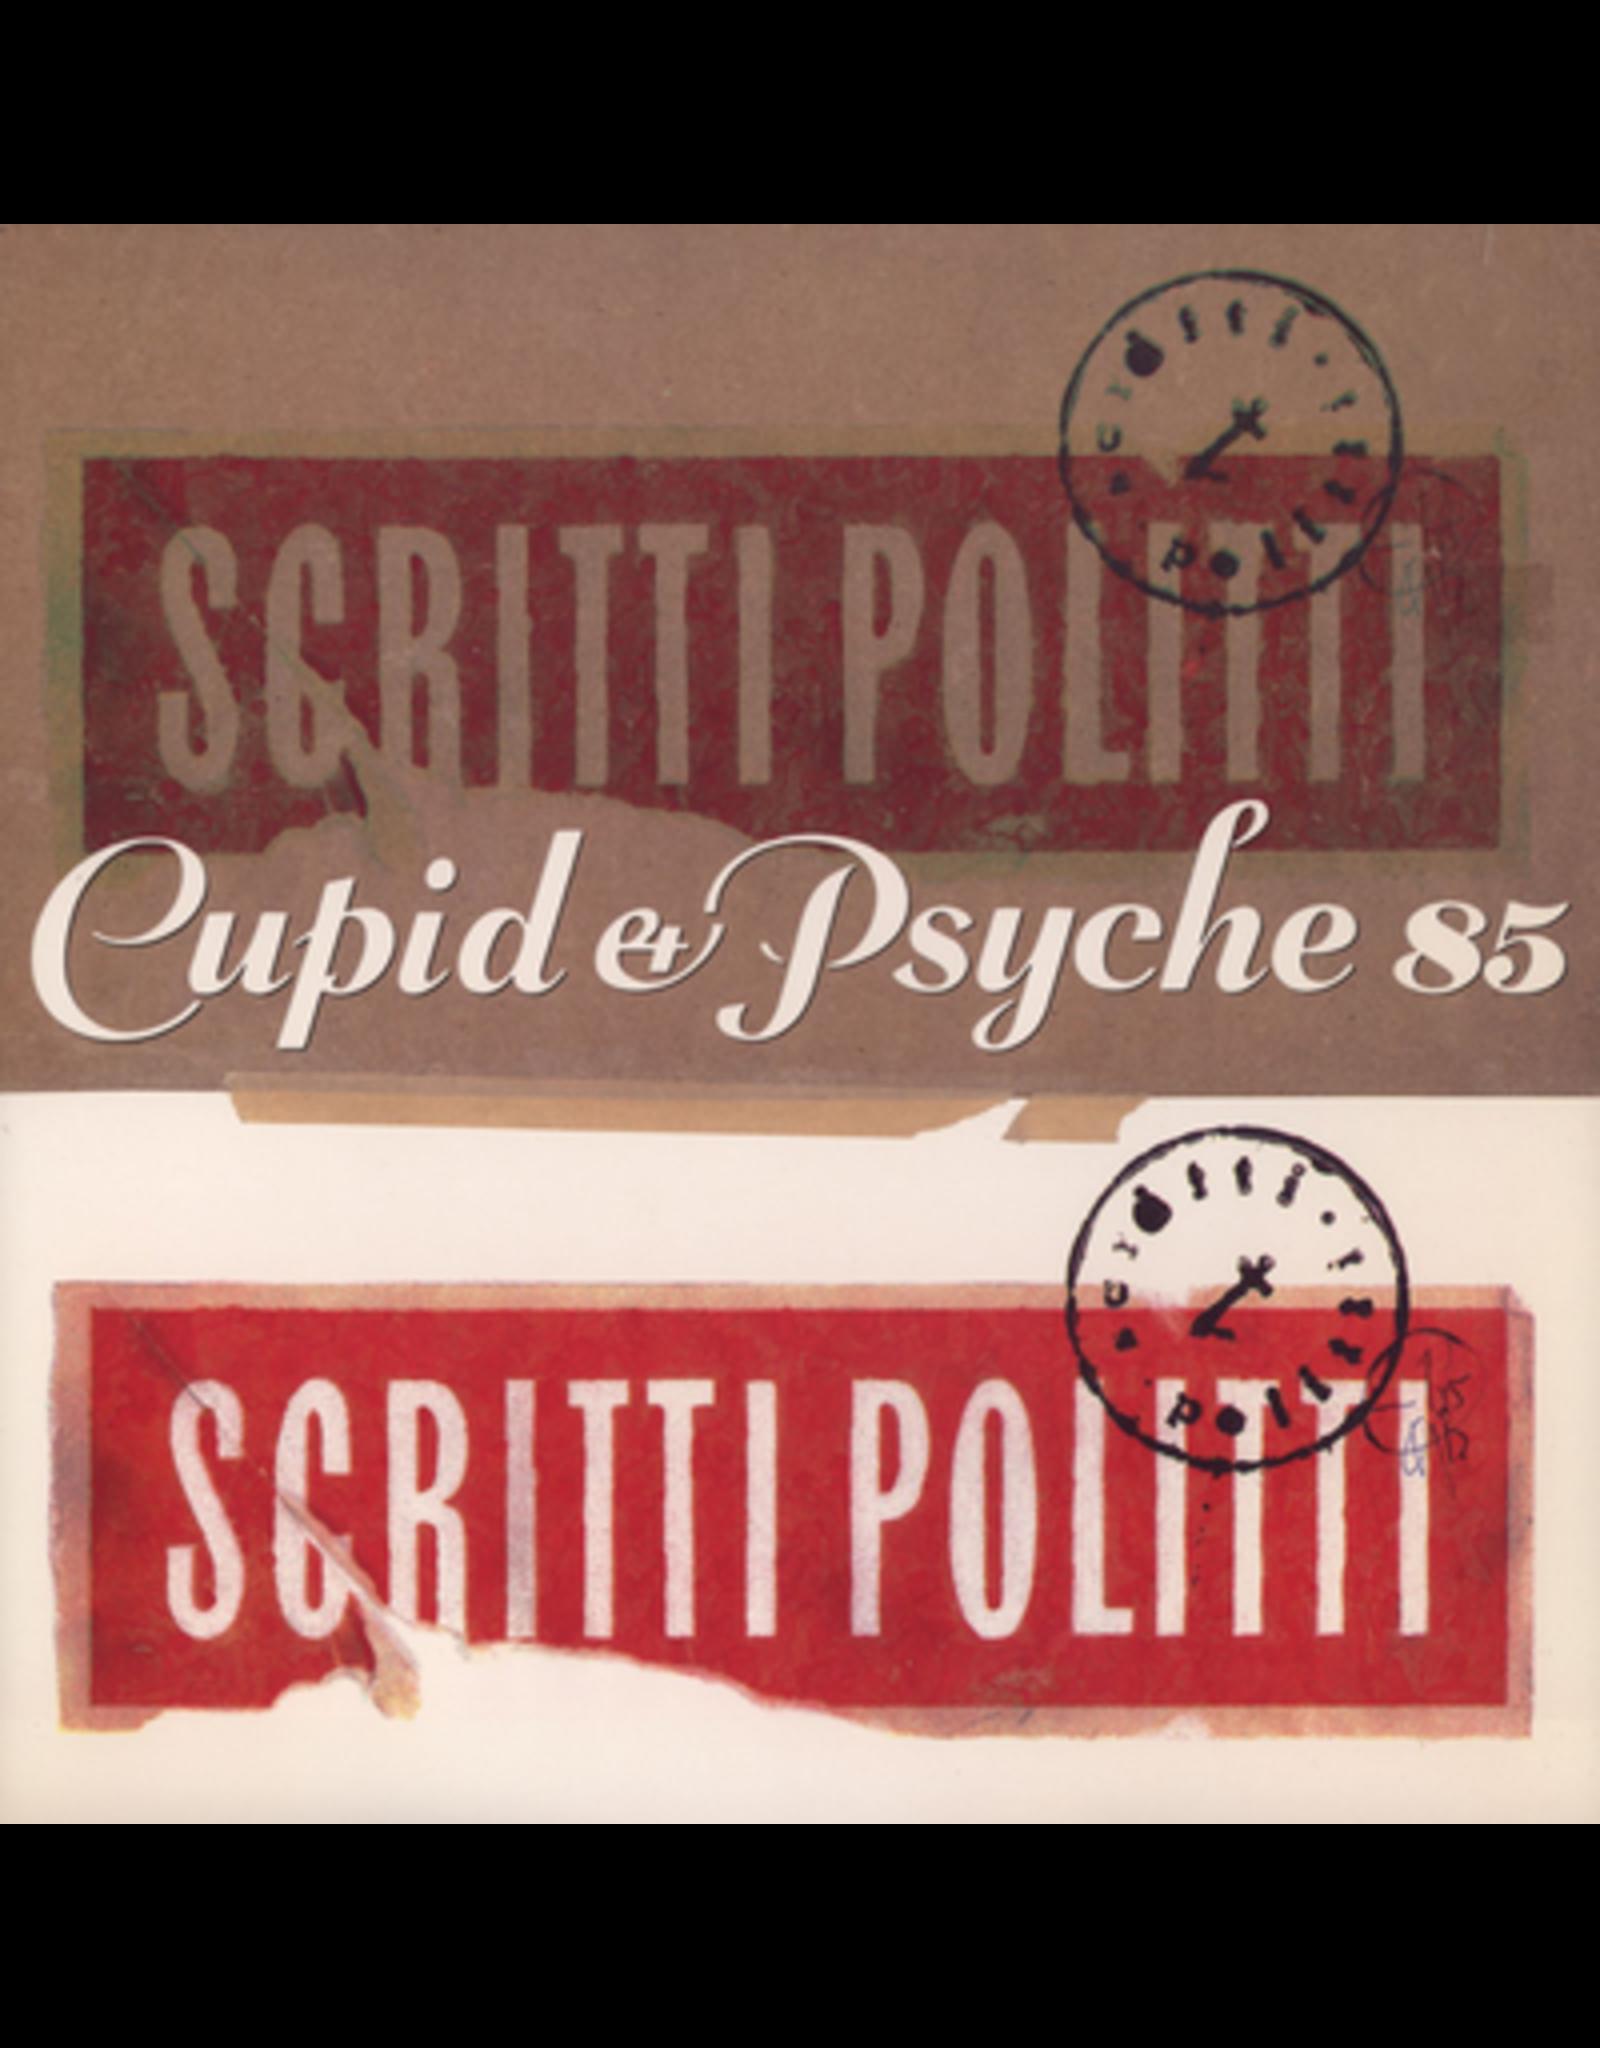 New Vinyl Scritti Politti - Cupid & Psyche 85 LP